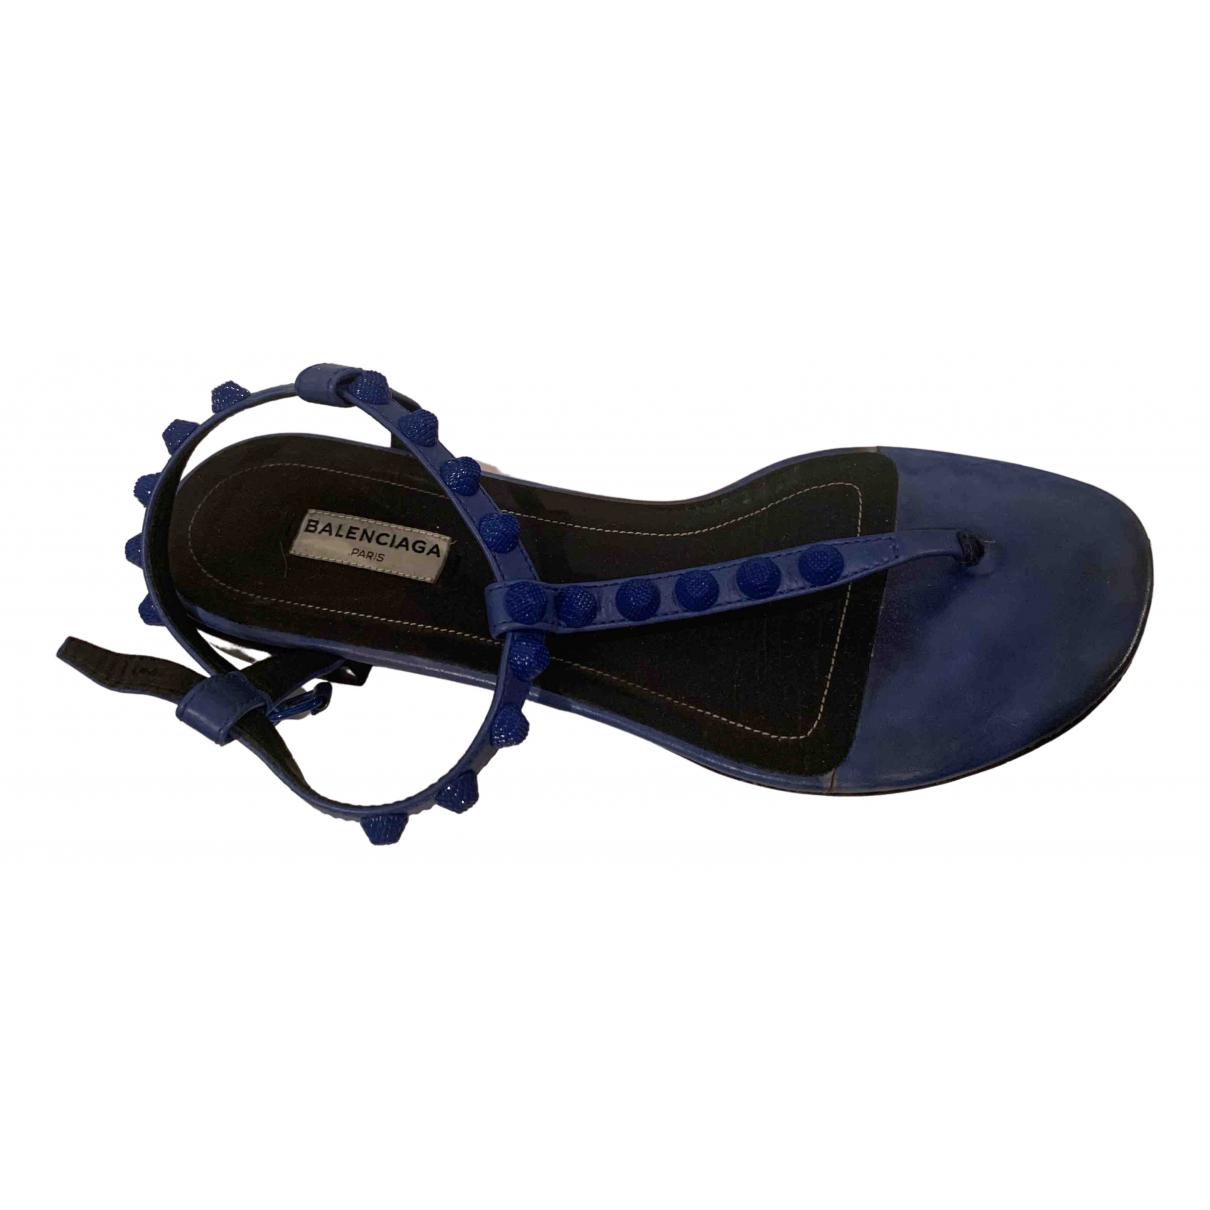 Balenciaga - Sandales   pour femme en cuir - bleu